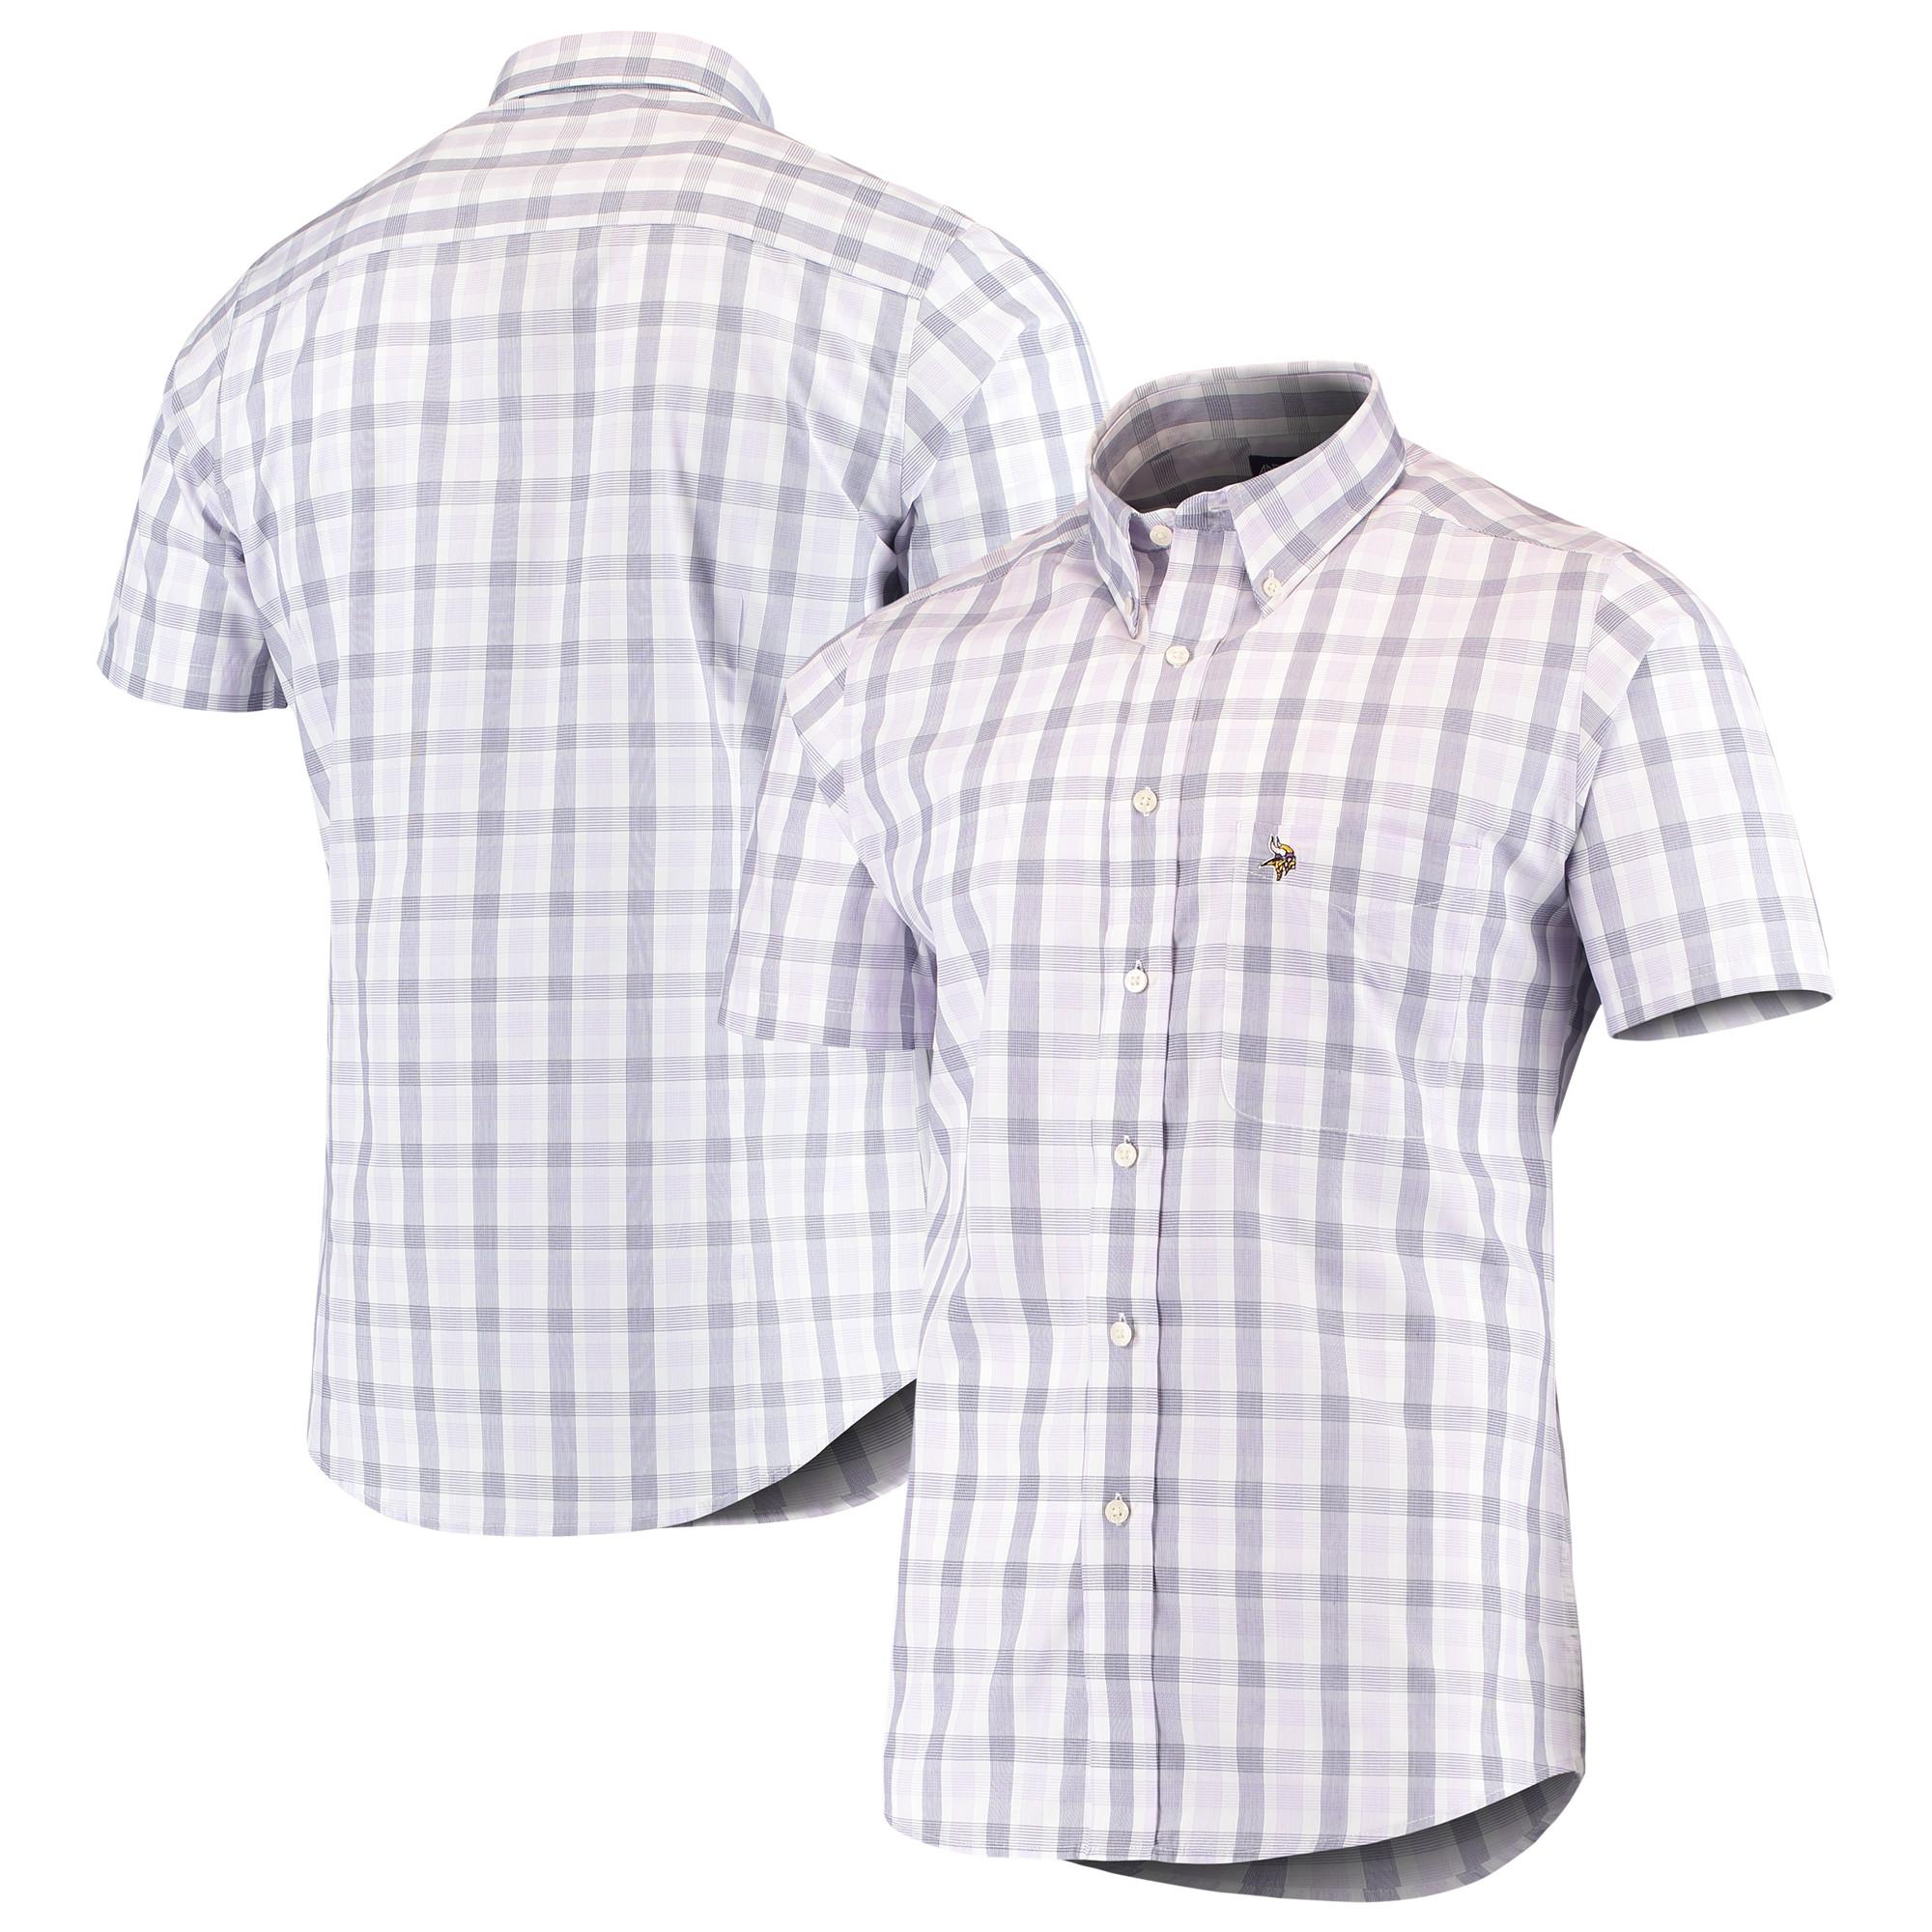 Minnesota Vikings Antigua Woven Button-Down Shirt - Purple - M